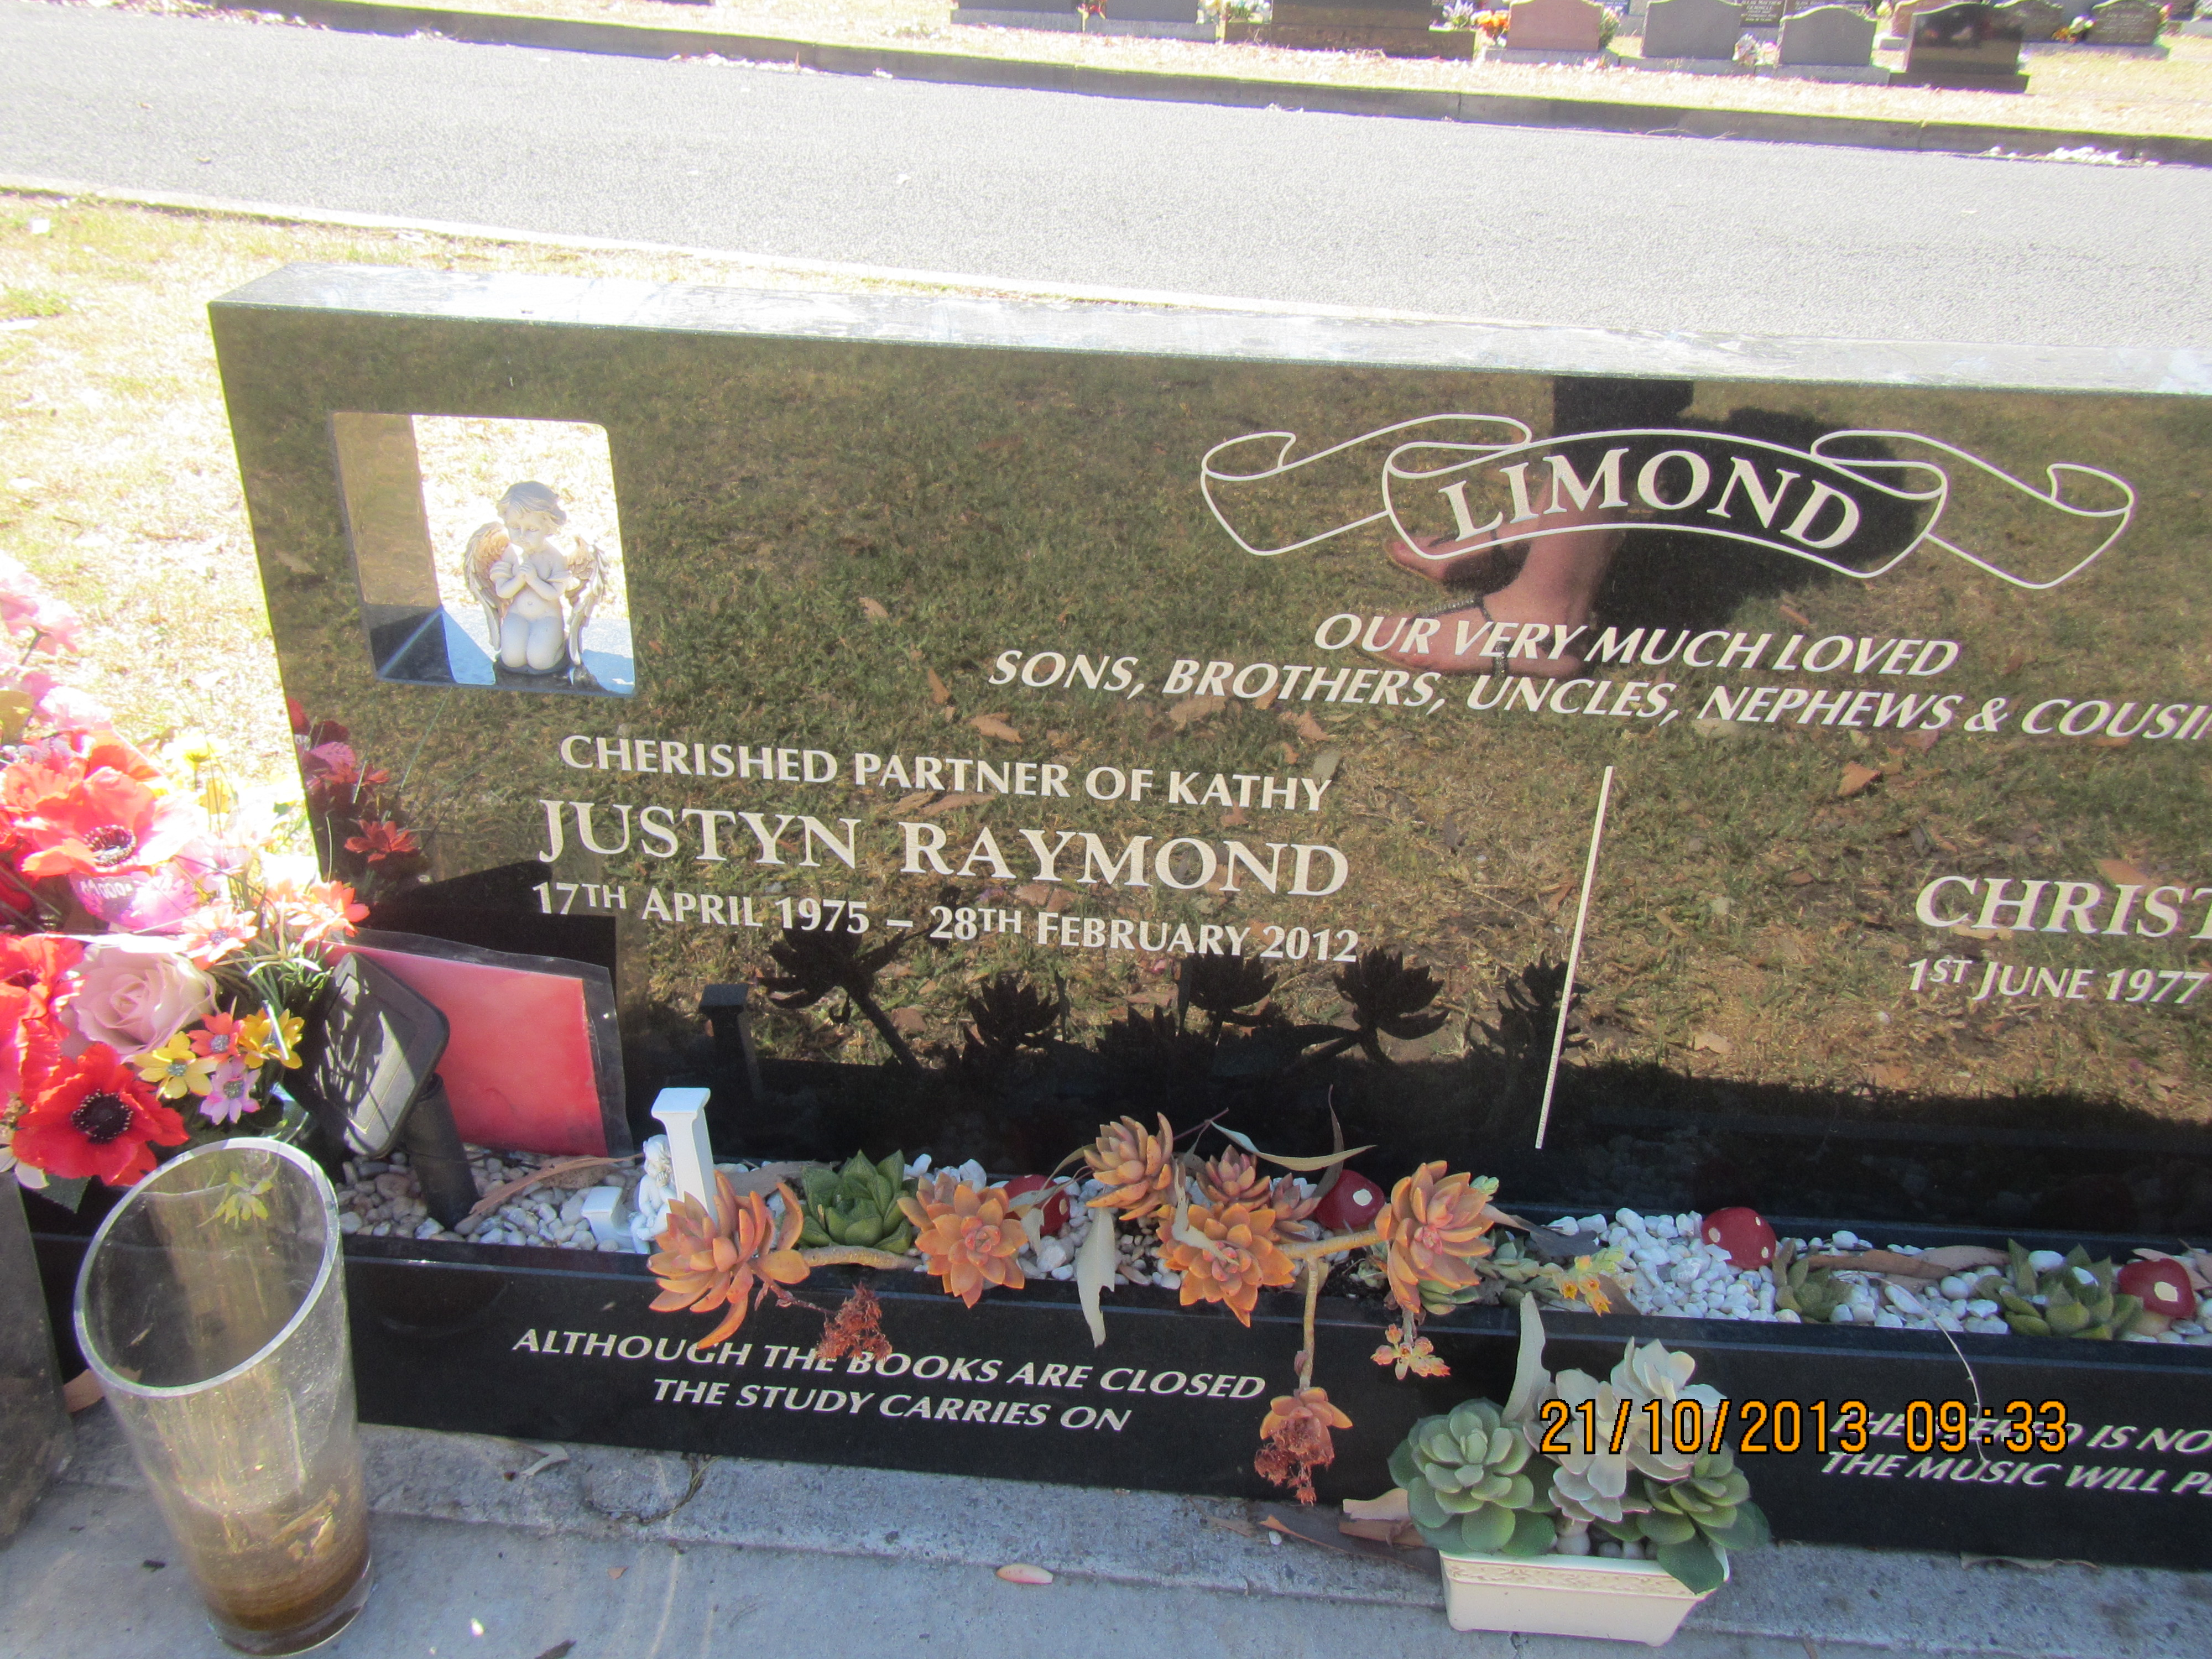 Justyn Raymond LIMOND - NSWPF - Died 28 Feb 2012 - Grave